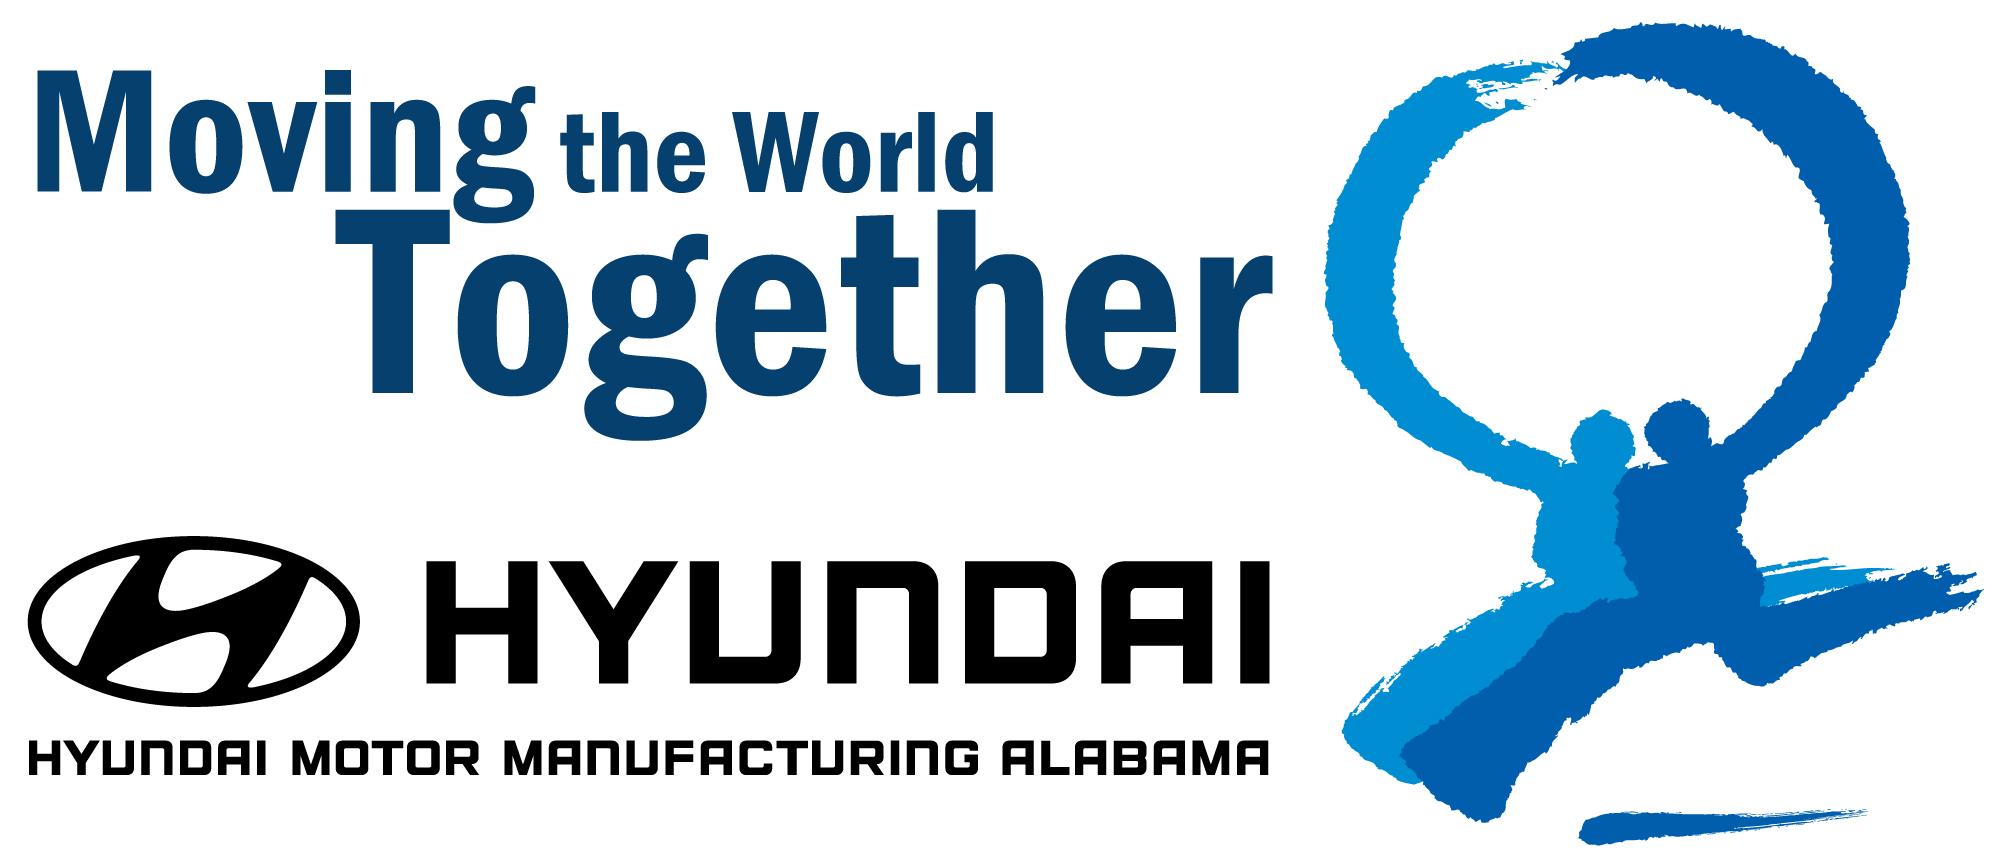 Social responsibility hyundai motor manufacturing for Hyundai motors customer service